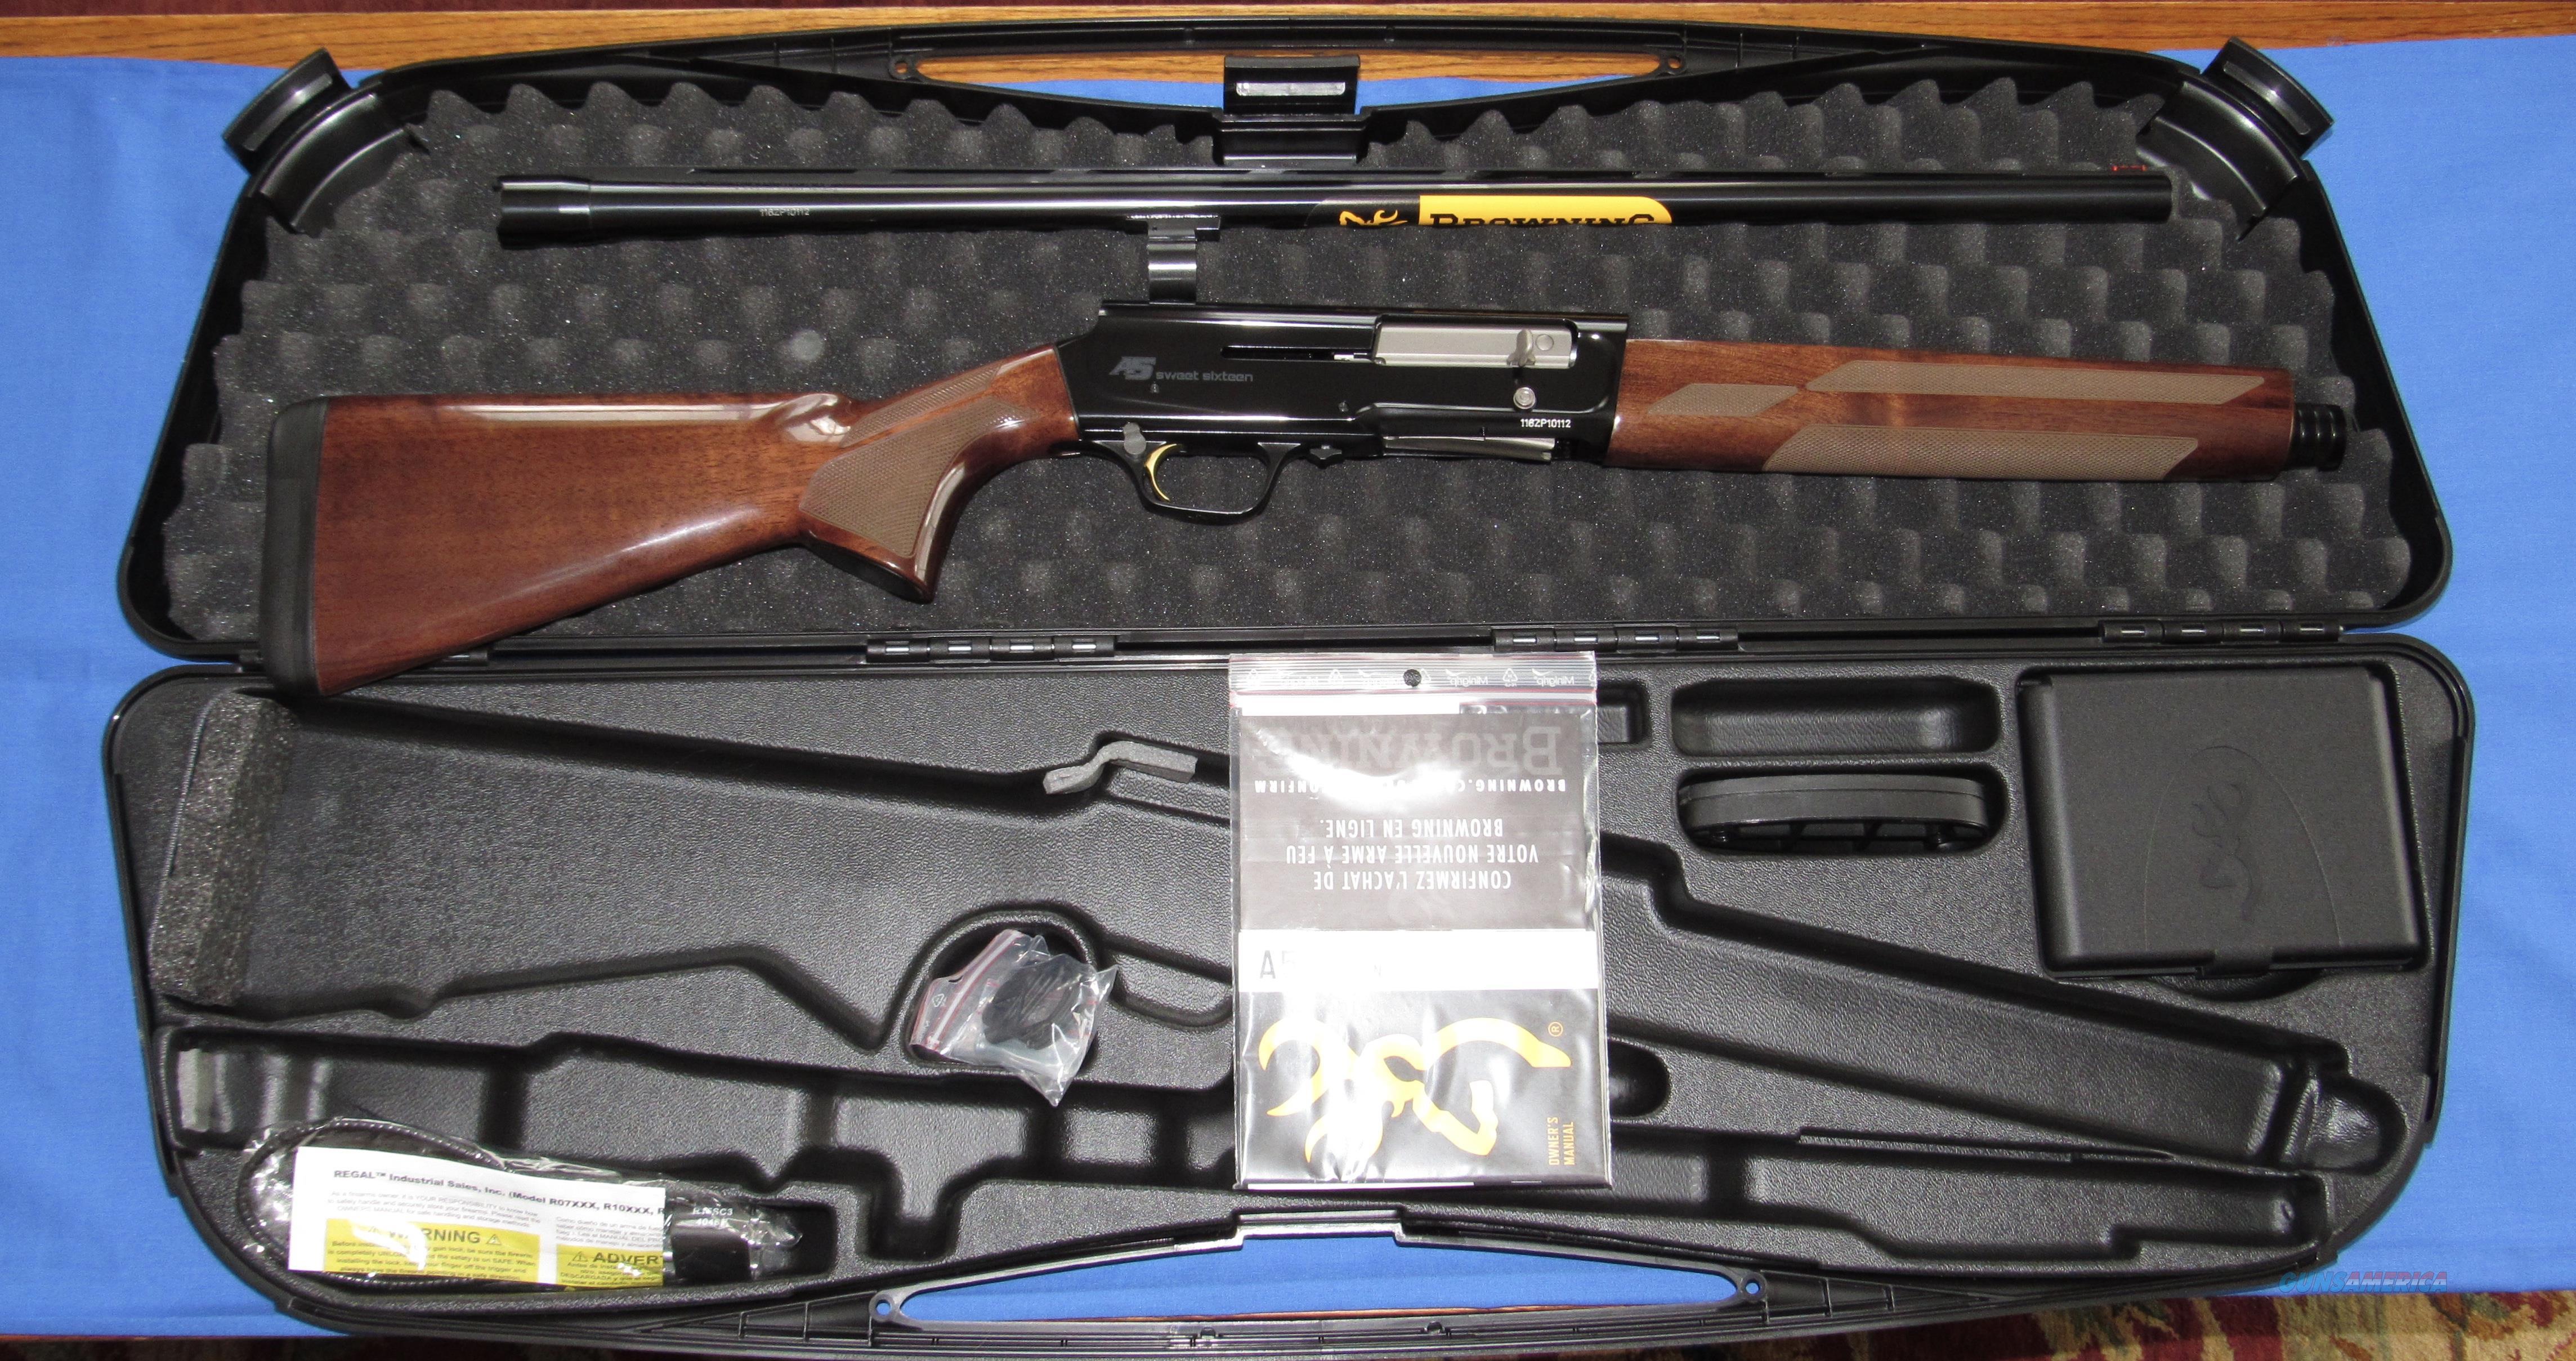 BROWING A5 SWEET SIXTEEN 16 GAUGE SEMI-AUTO SHOTGUN  Guns > Shotguns > Browning Shotguns > Autoloaders > Hunting